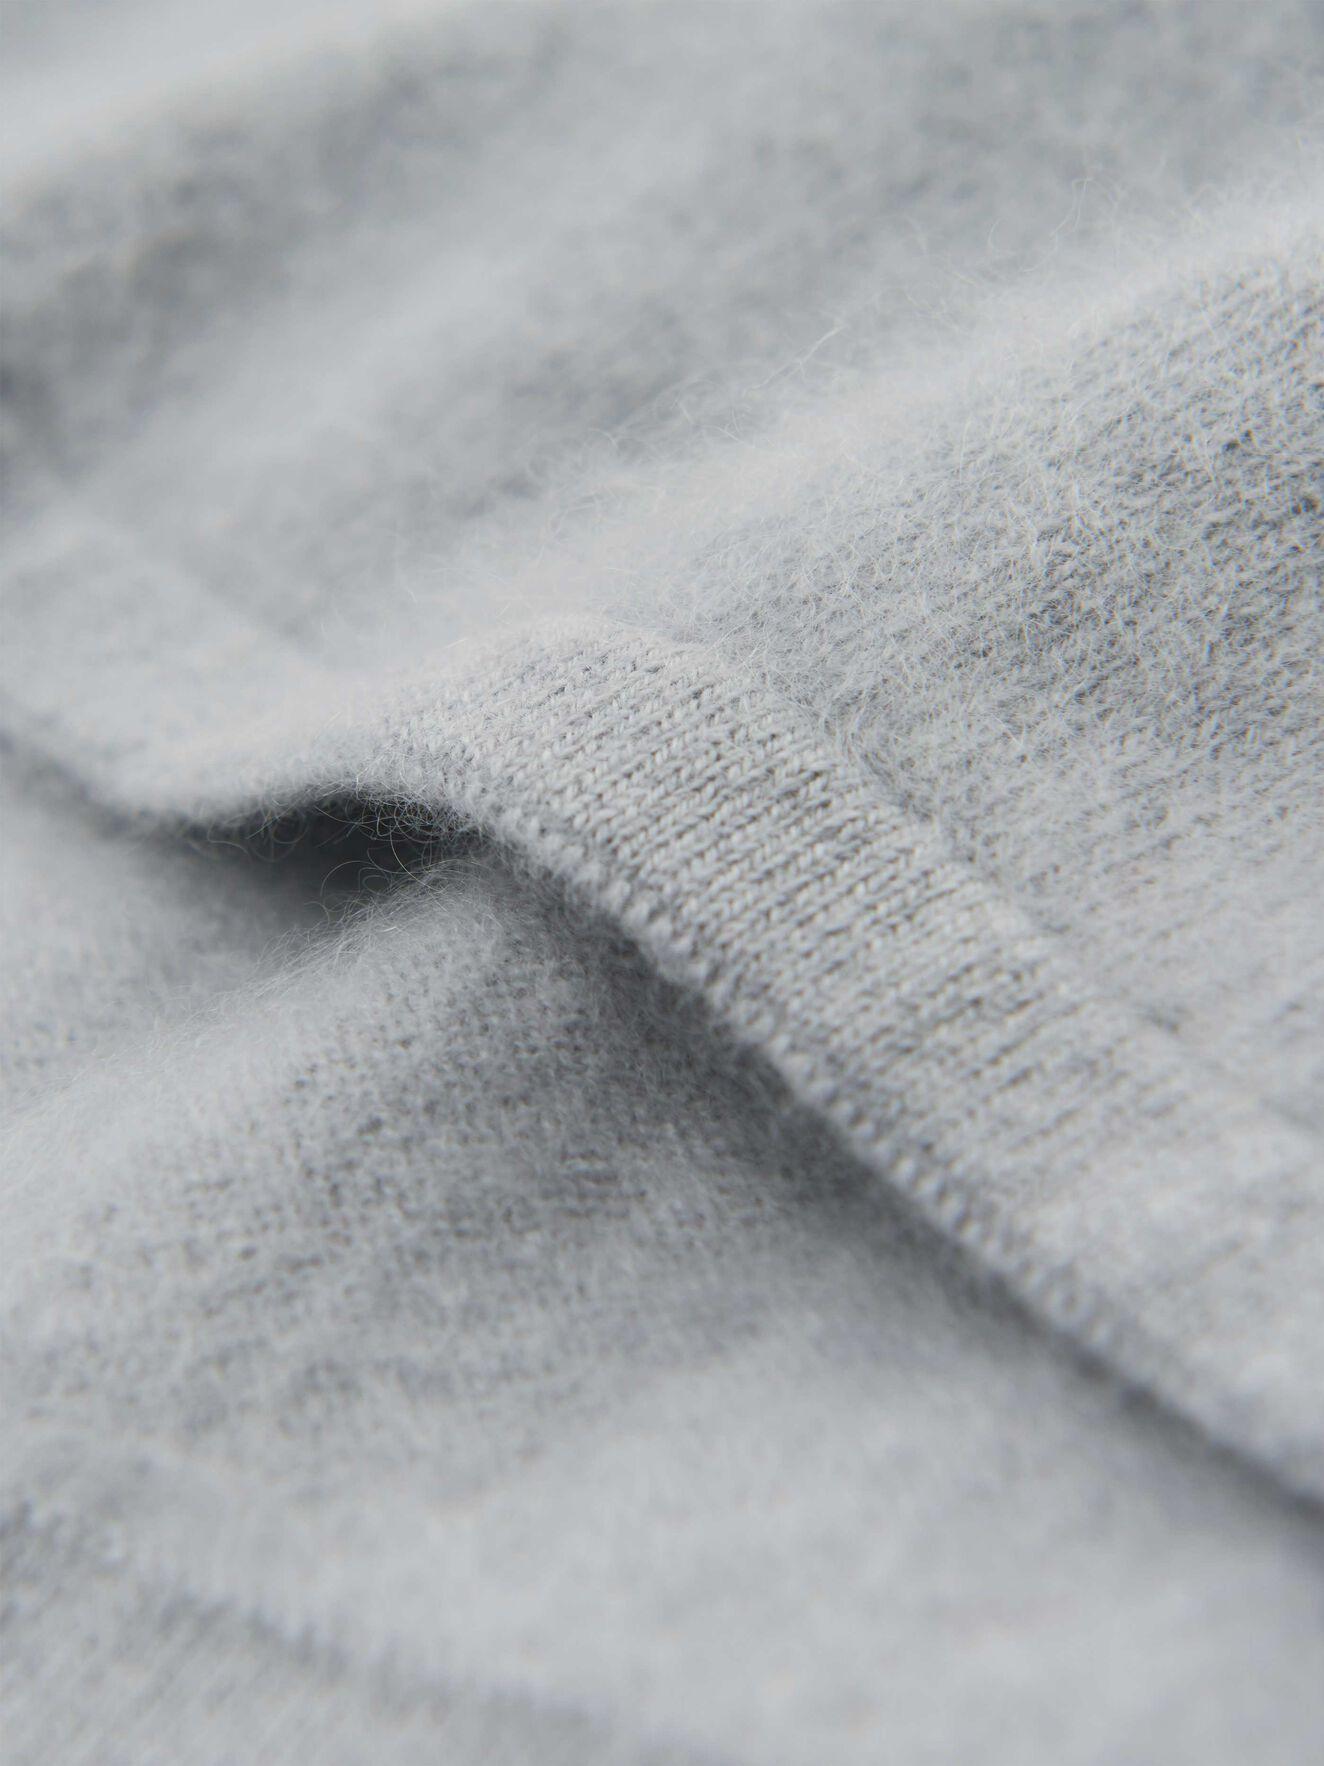 Kleo Pullover in Aluminium Grey from Tiger of Sweden